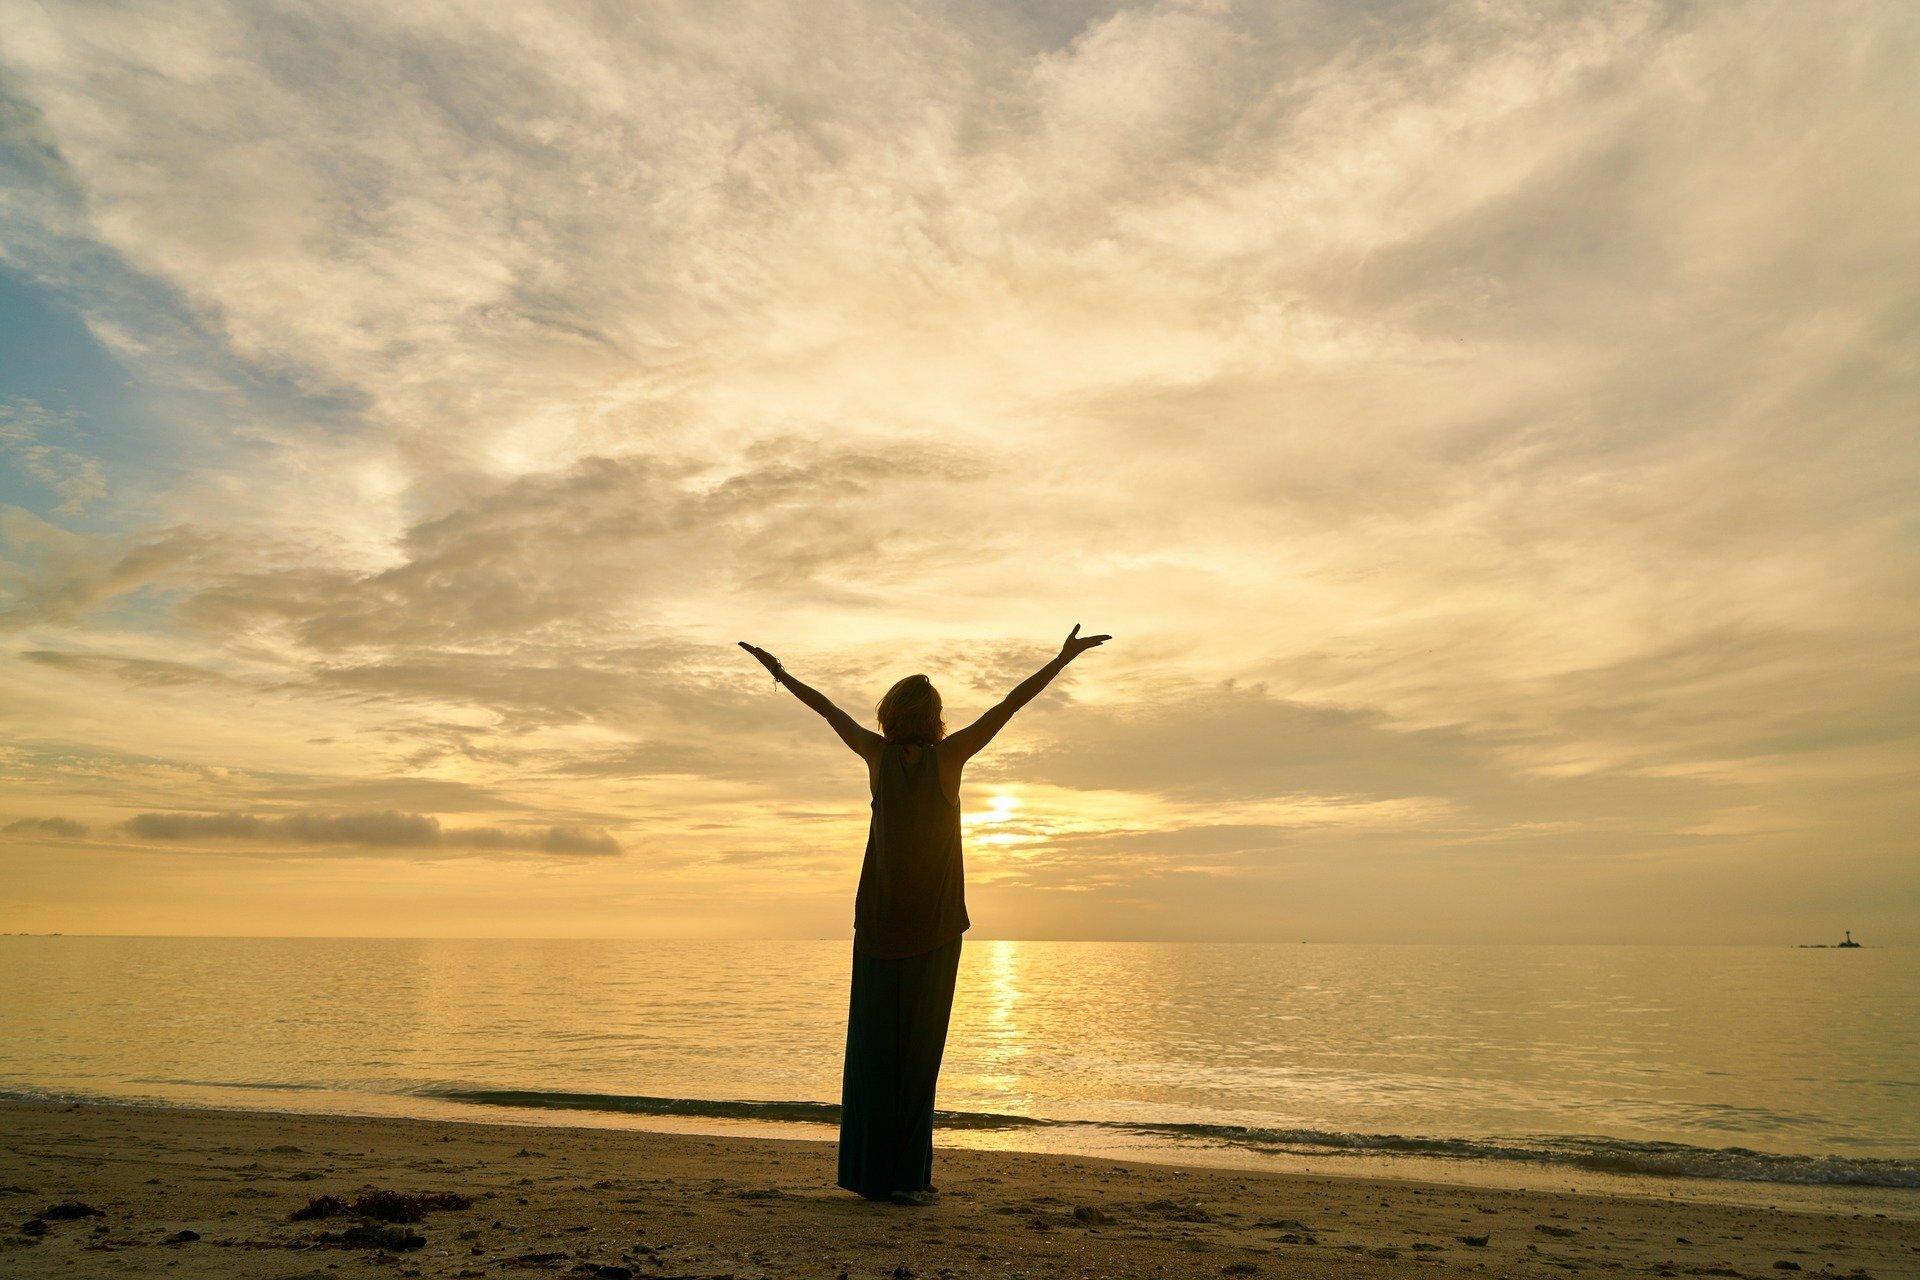 Yoga op het strand met zonsondergang VVV Texel